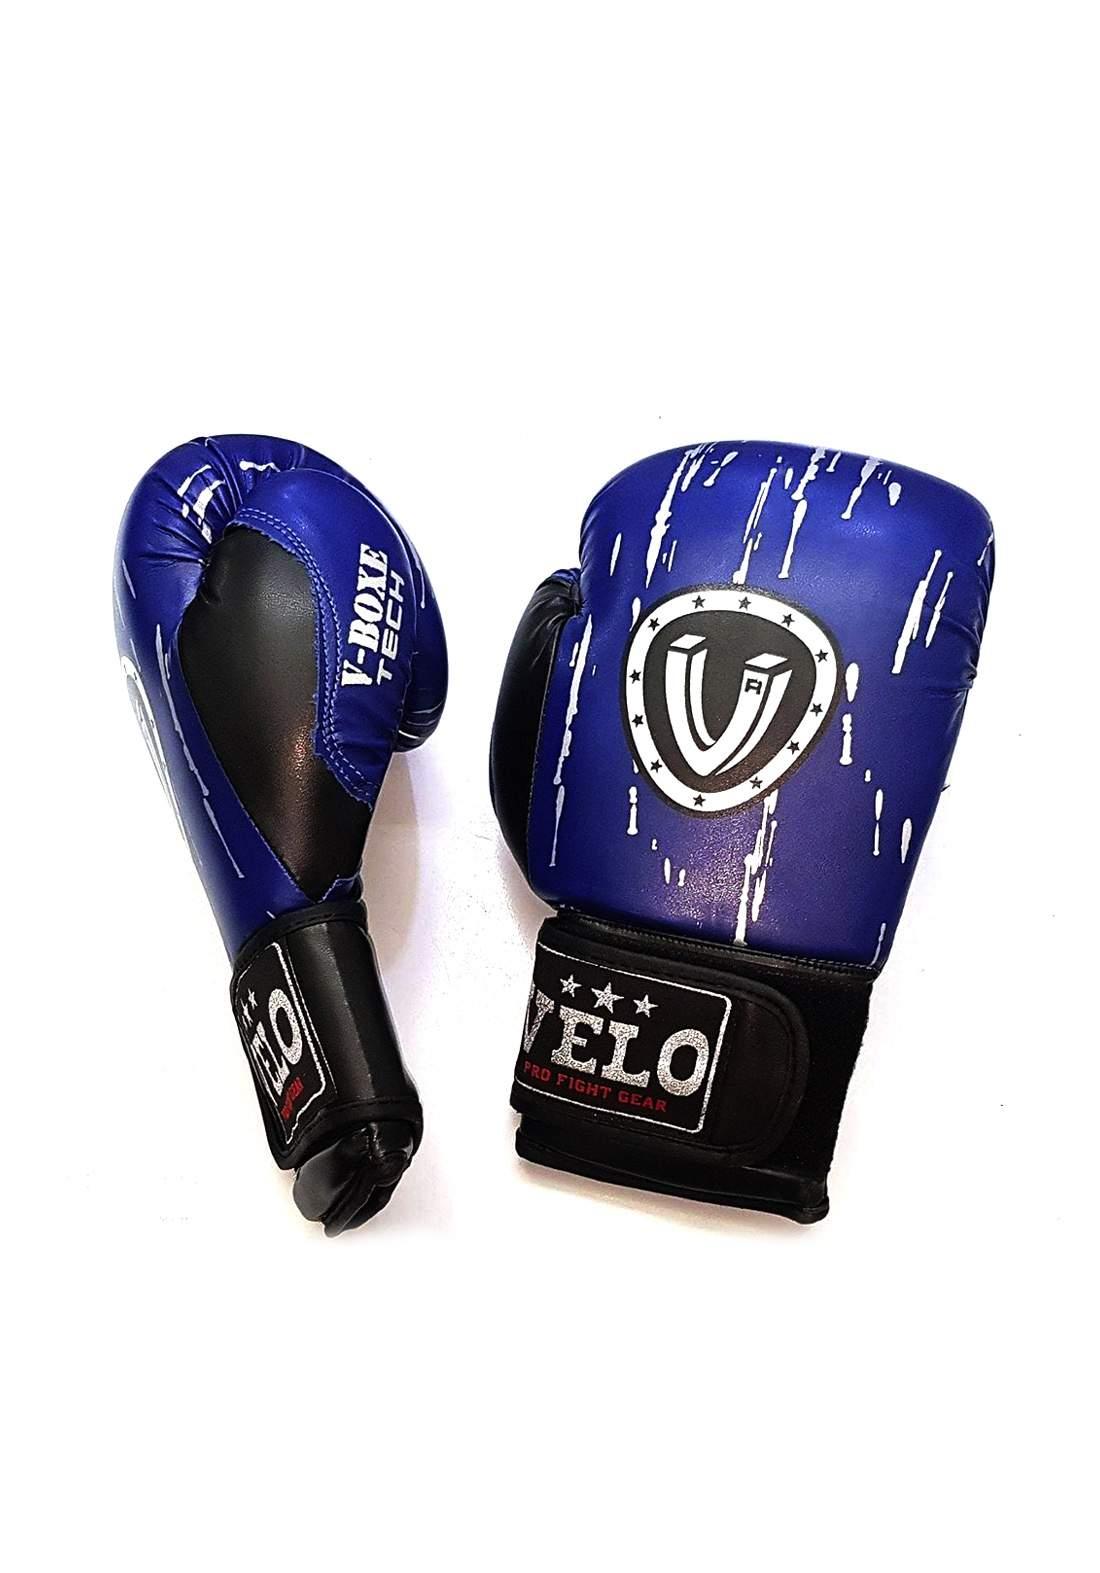 Velo Boxing palm قفازات ملاكمة